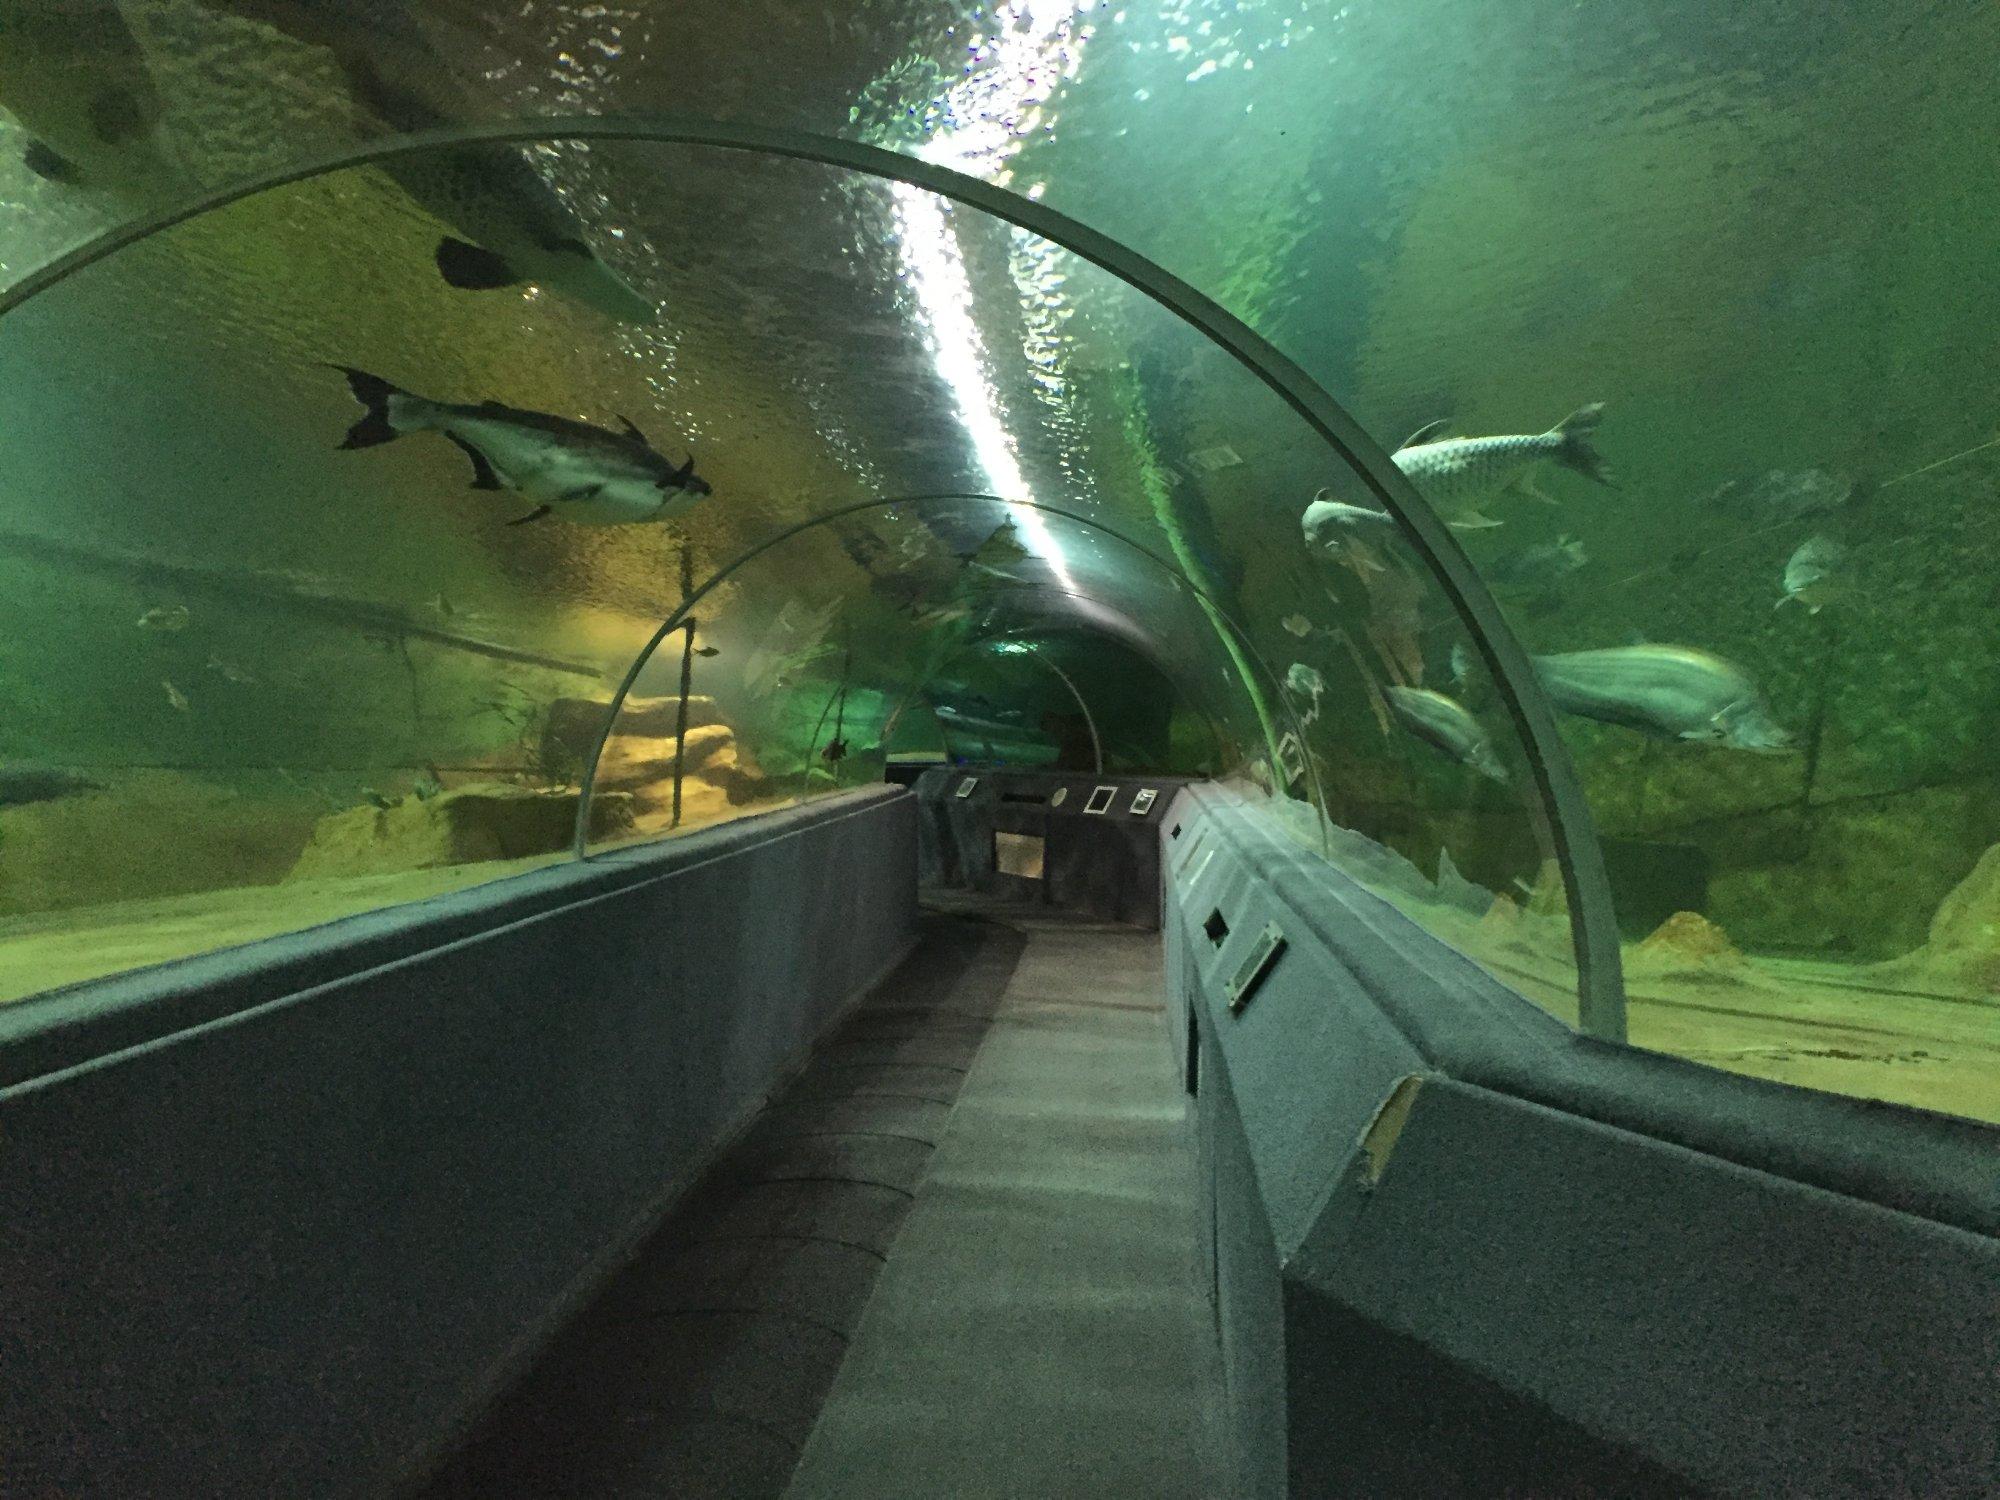 Chiang Mai Zoo Aquarium (Thailand): Top Tips Before You Go - TripAdvisor